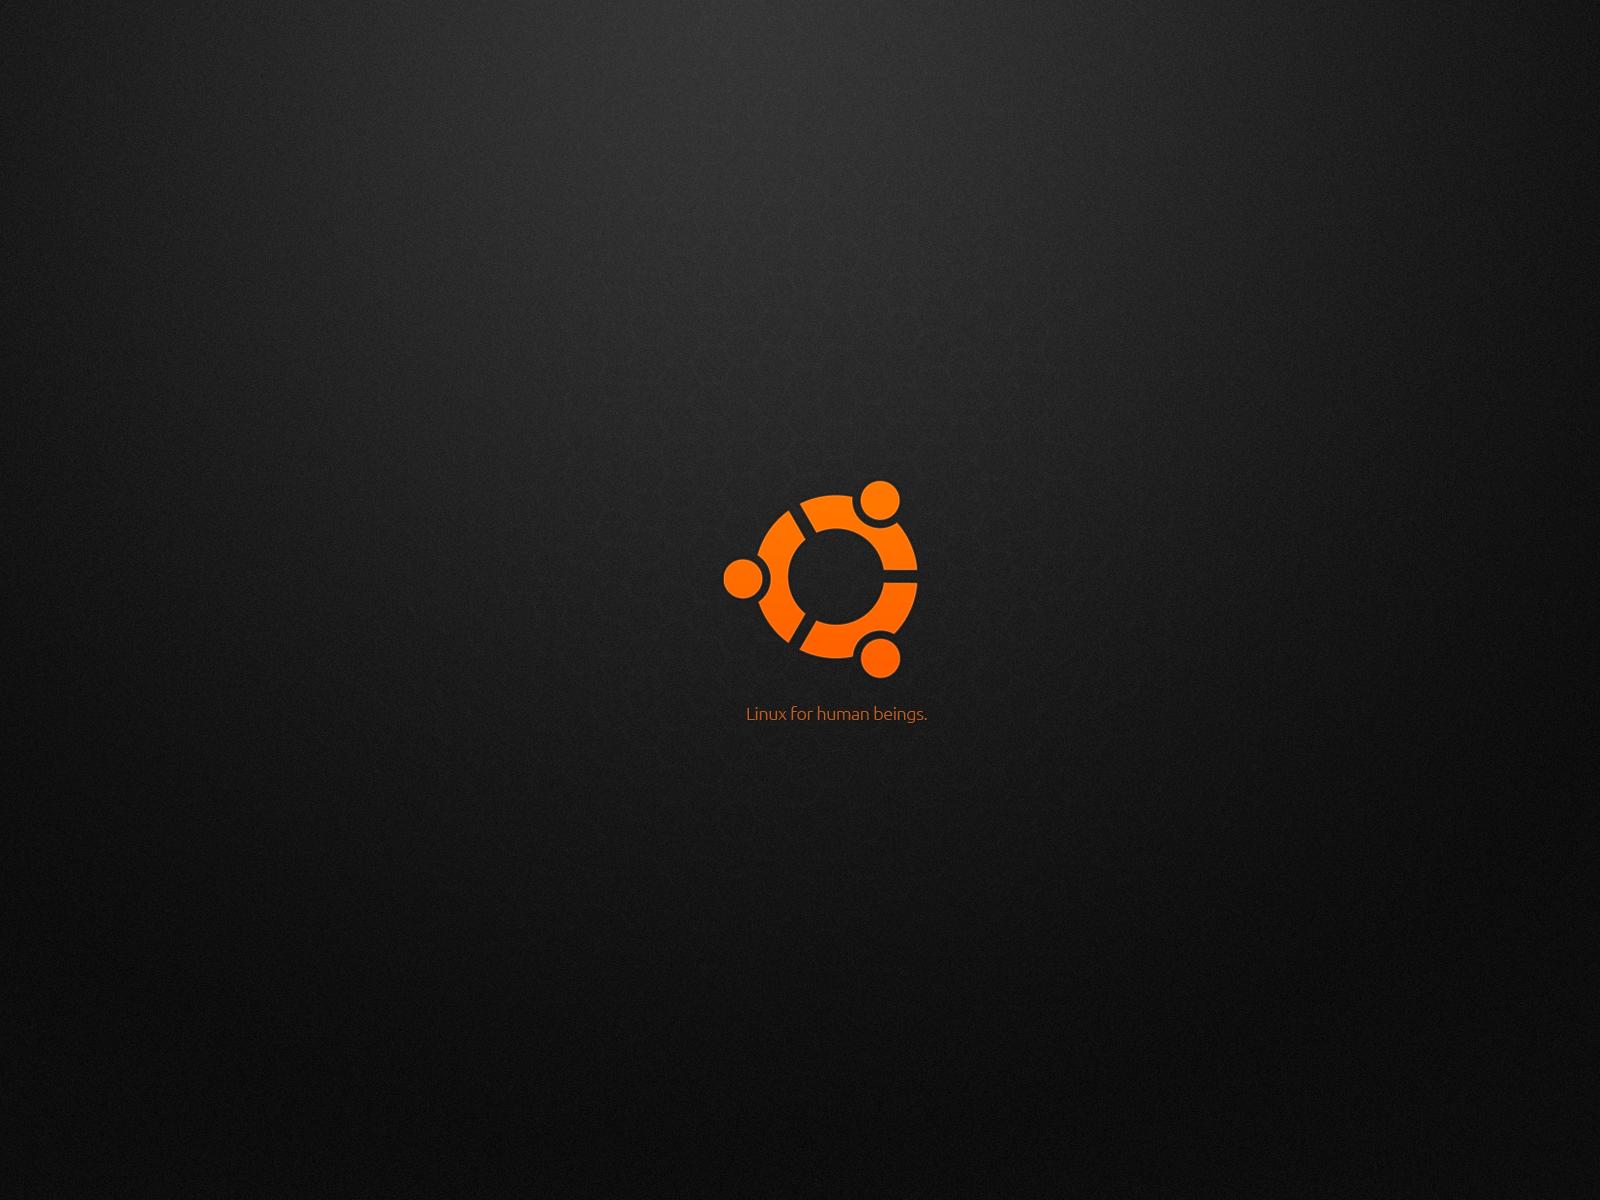 Install Netflix Ubuntu 1204 1210 HowTo 1600x1200